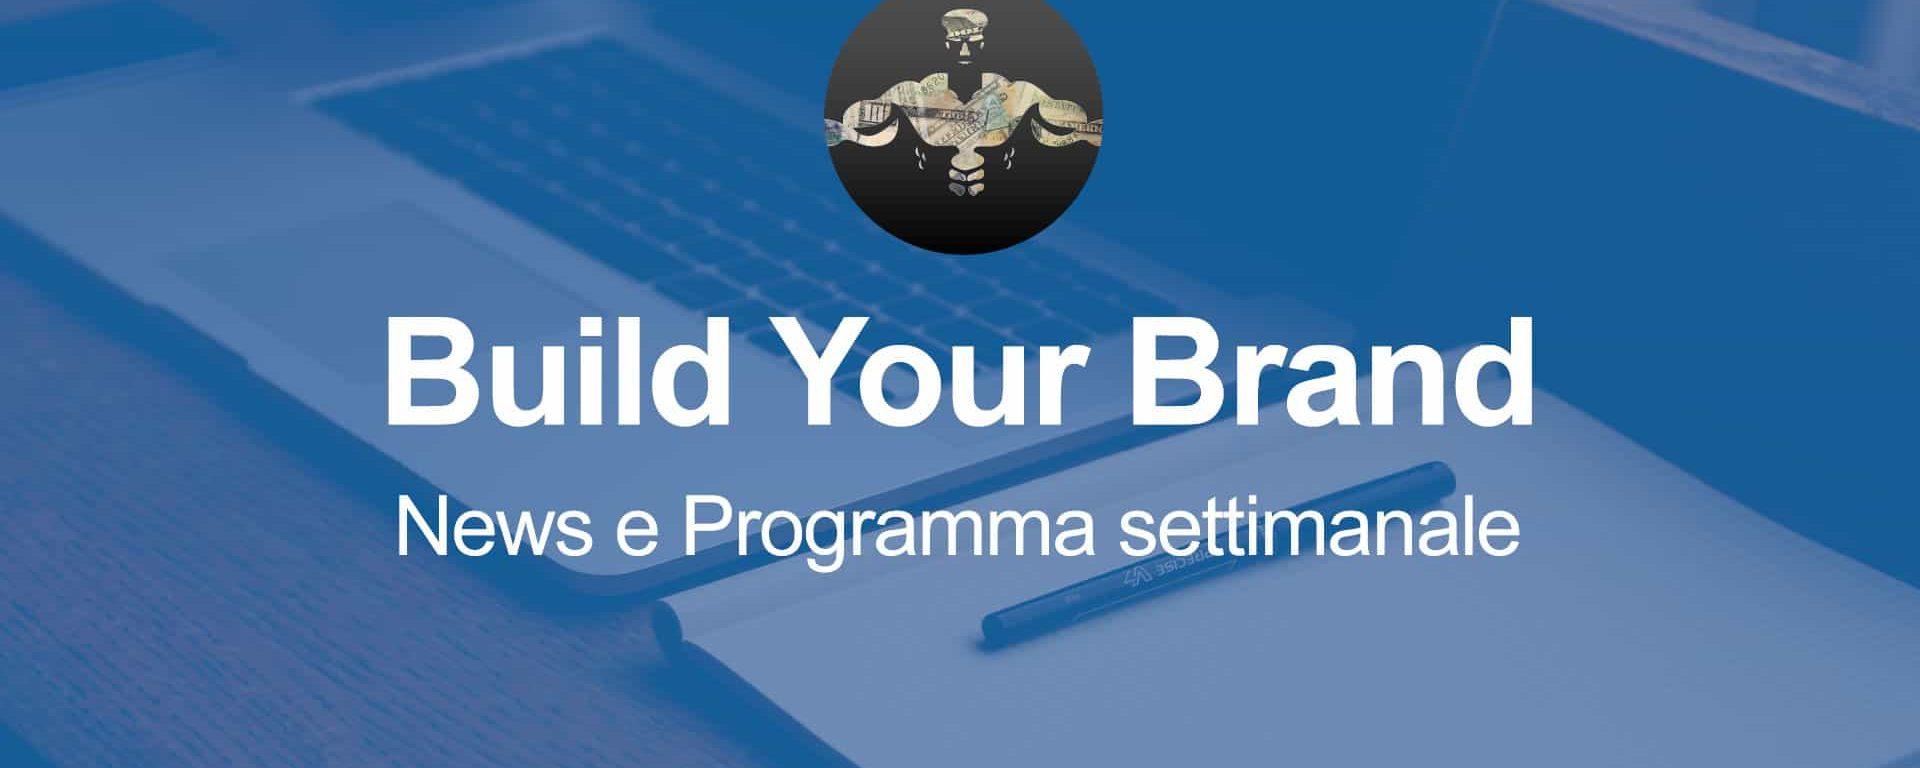 Build Your Brand News – Programma Settimanale Community